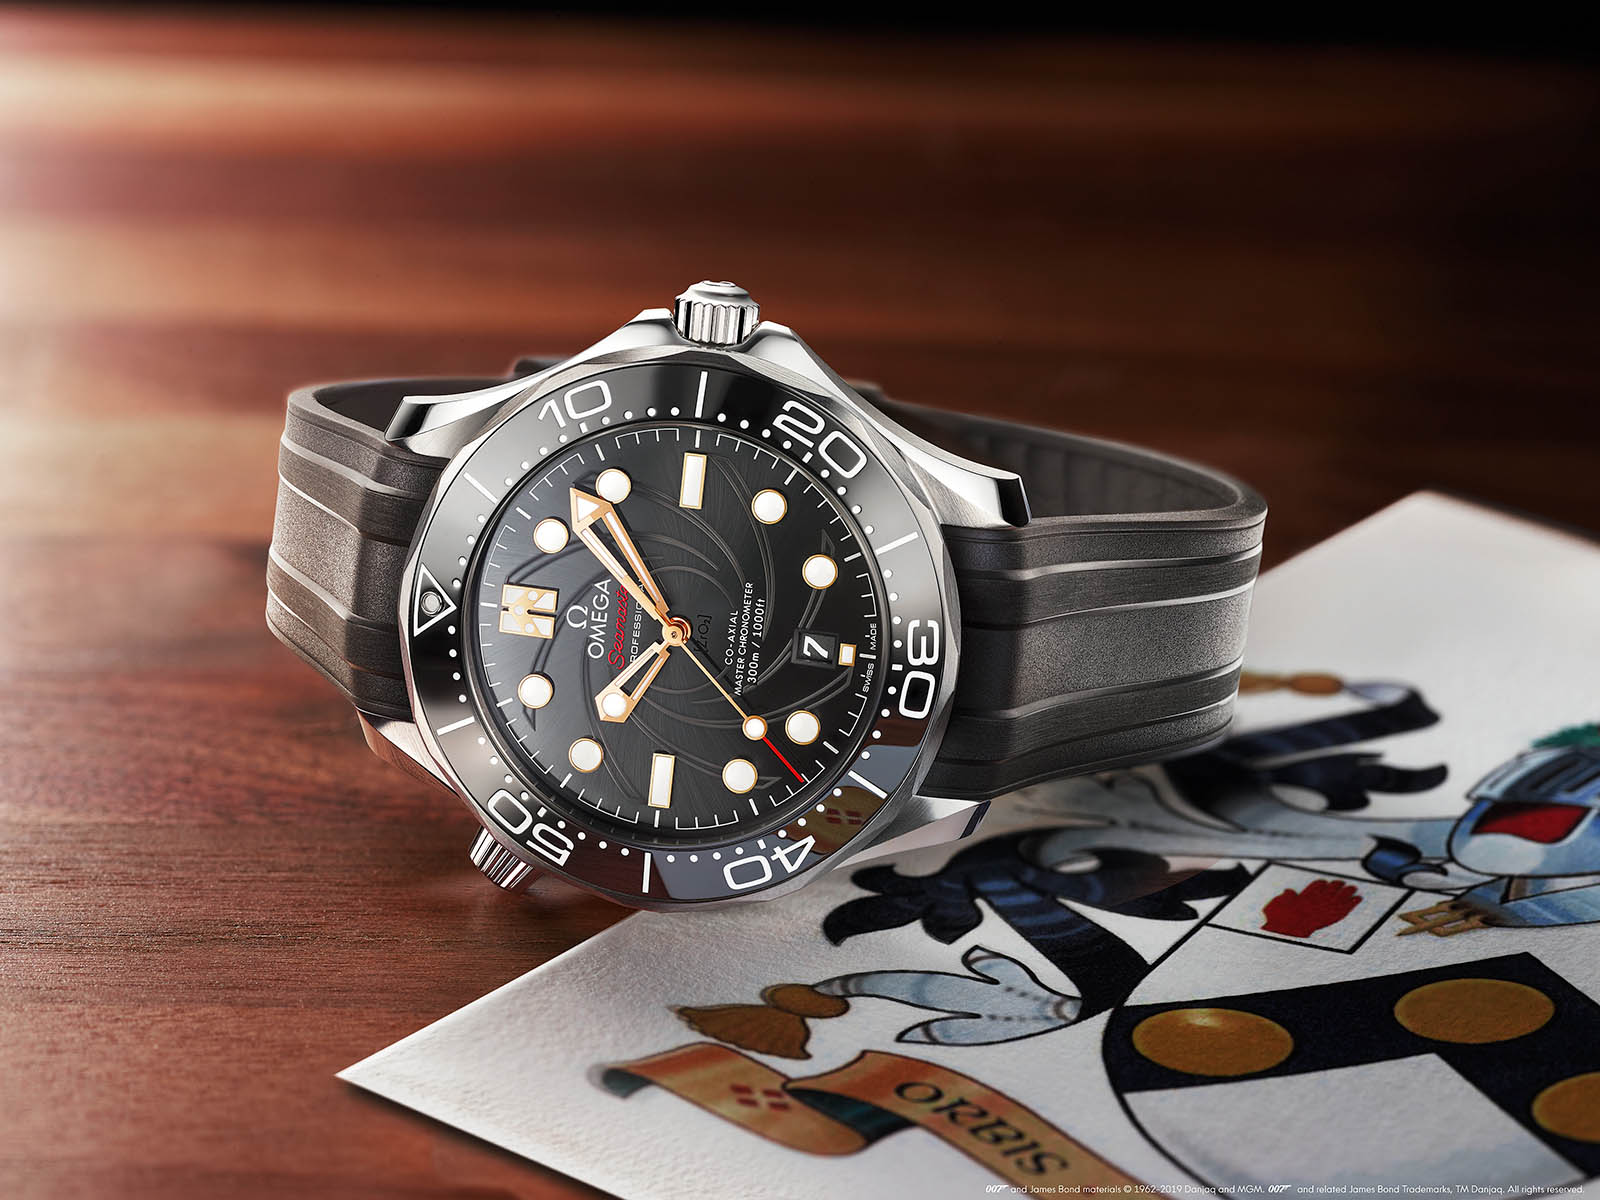 210-22-42-20-01-004-omega-seamaster-300m-diver-007-1-.jpg